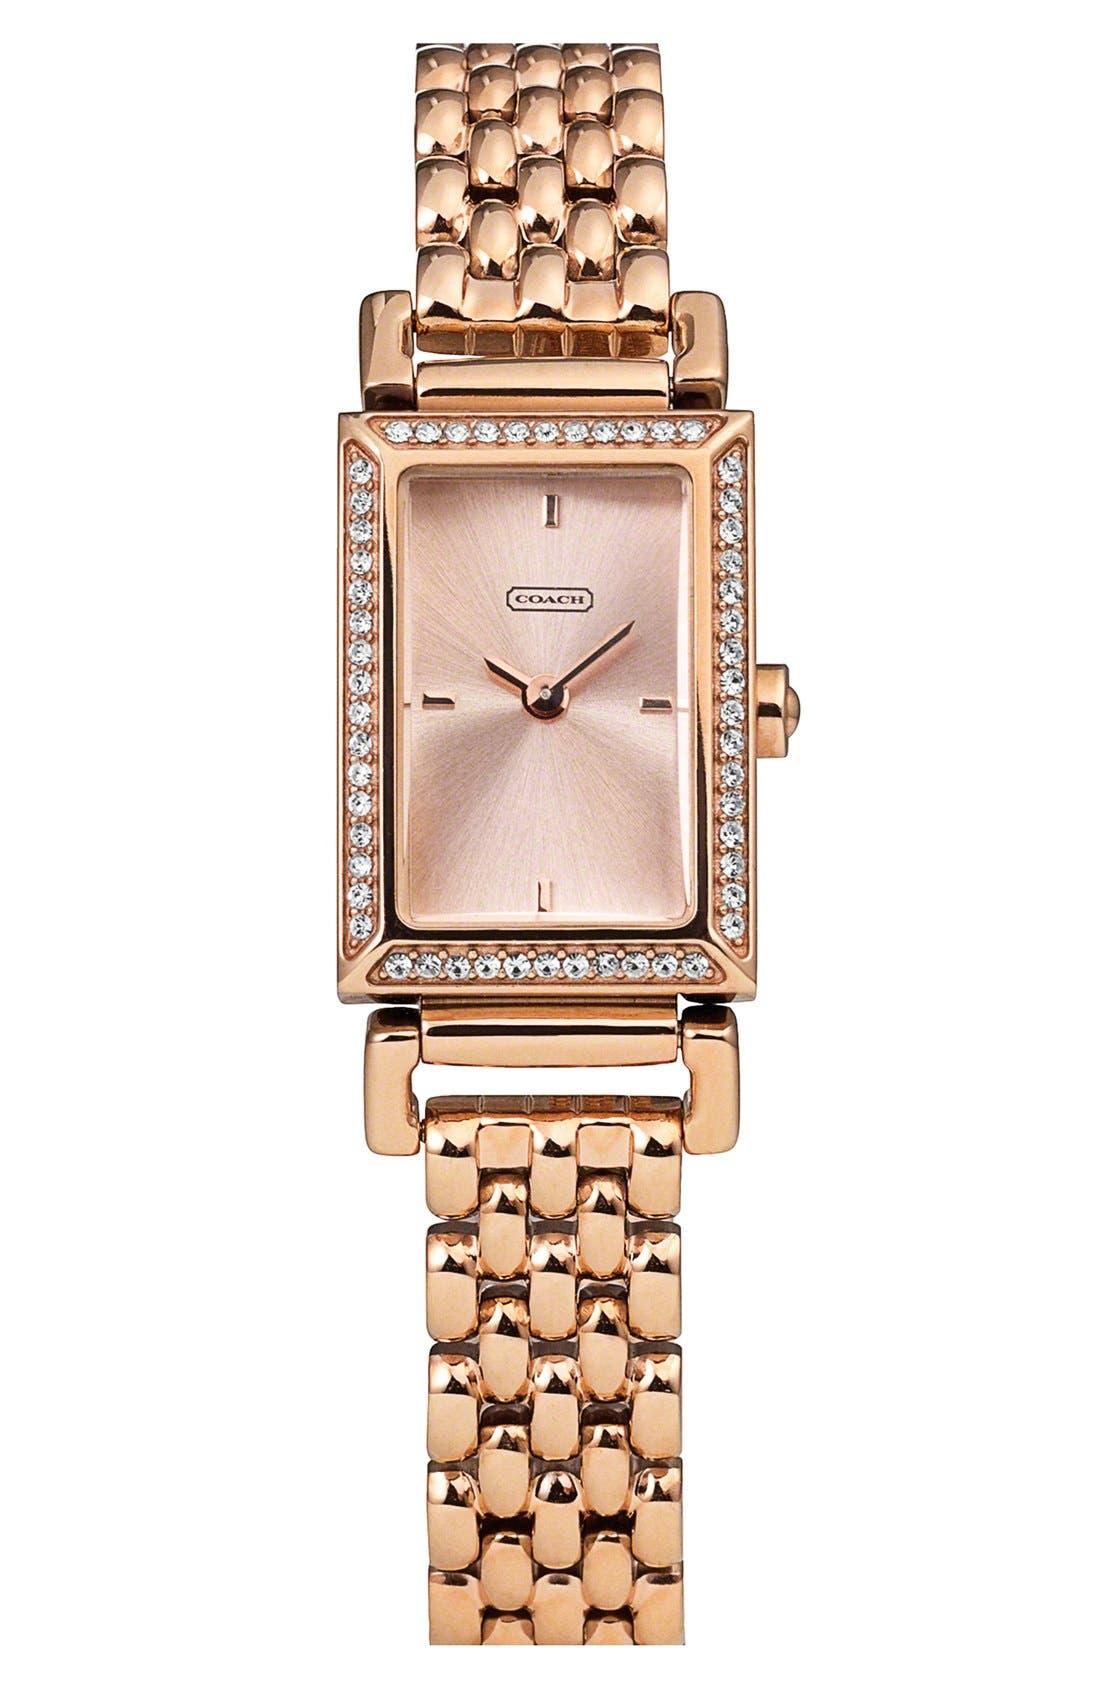 Alternate Image 1 Selected - COACH 'Madison' Crystal Bezel Bracelet Watch, 17mm x 30mm